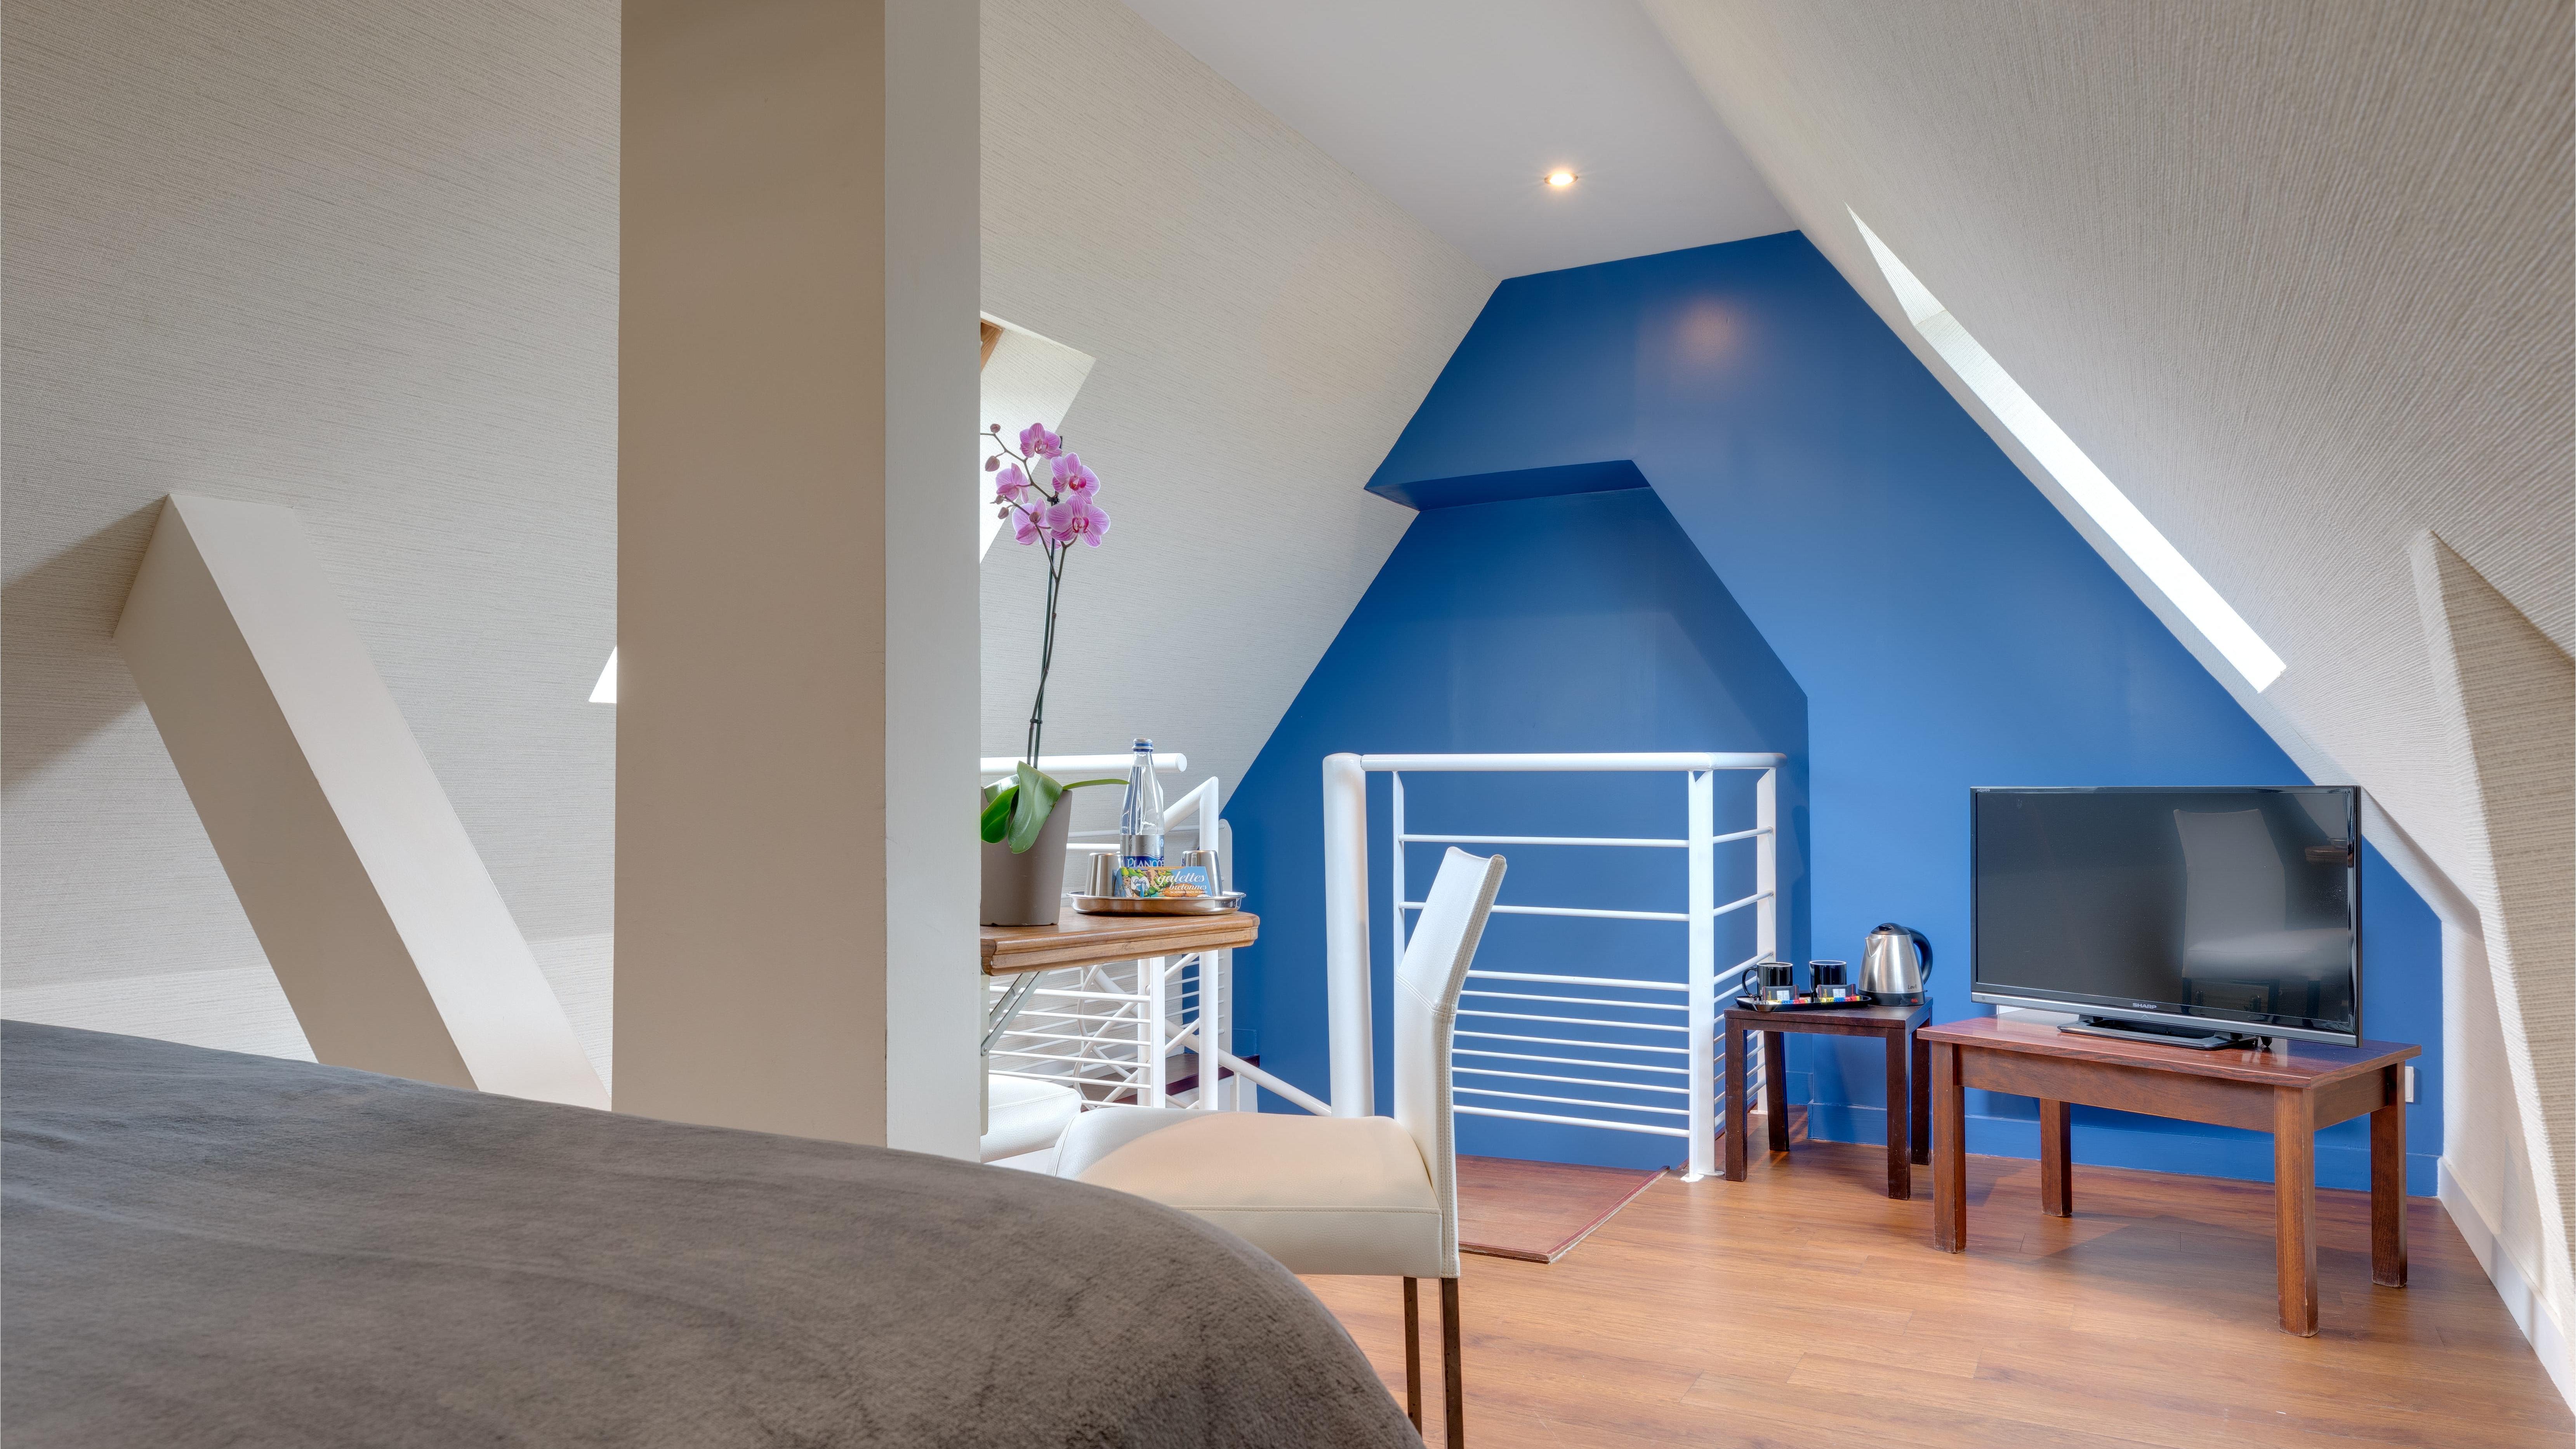 Duplex Room at Ar Men Du Hotel in Névez, Brittany